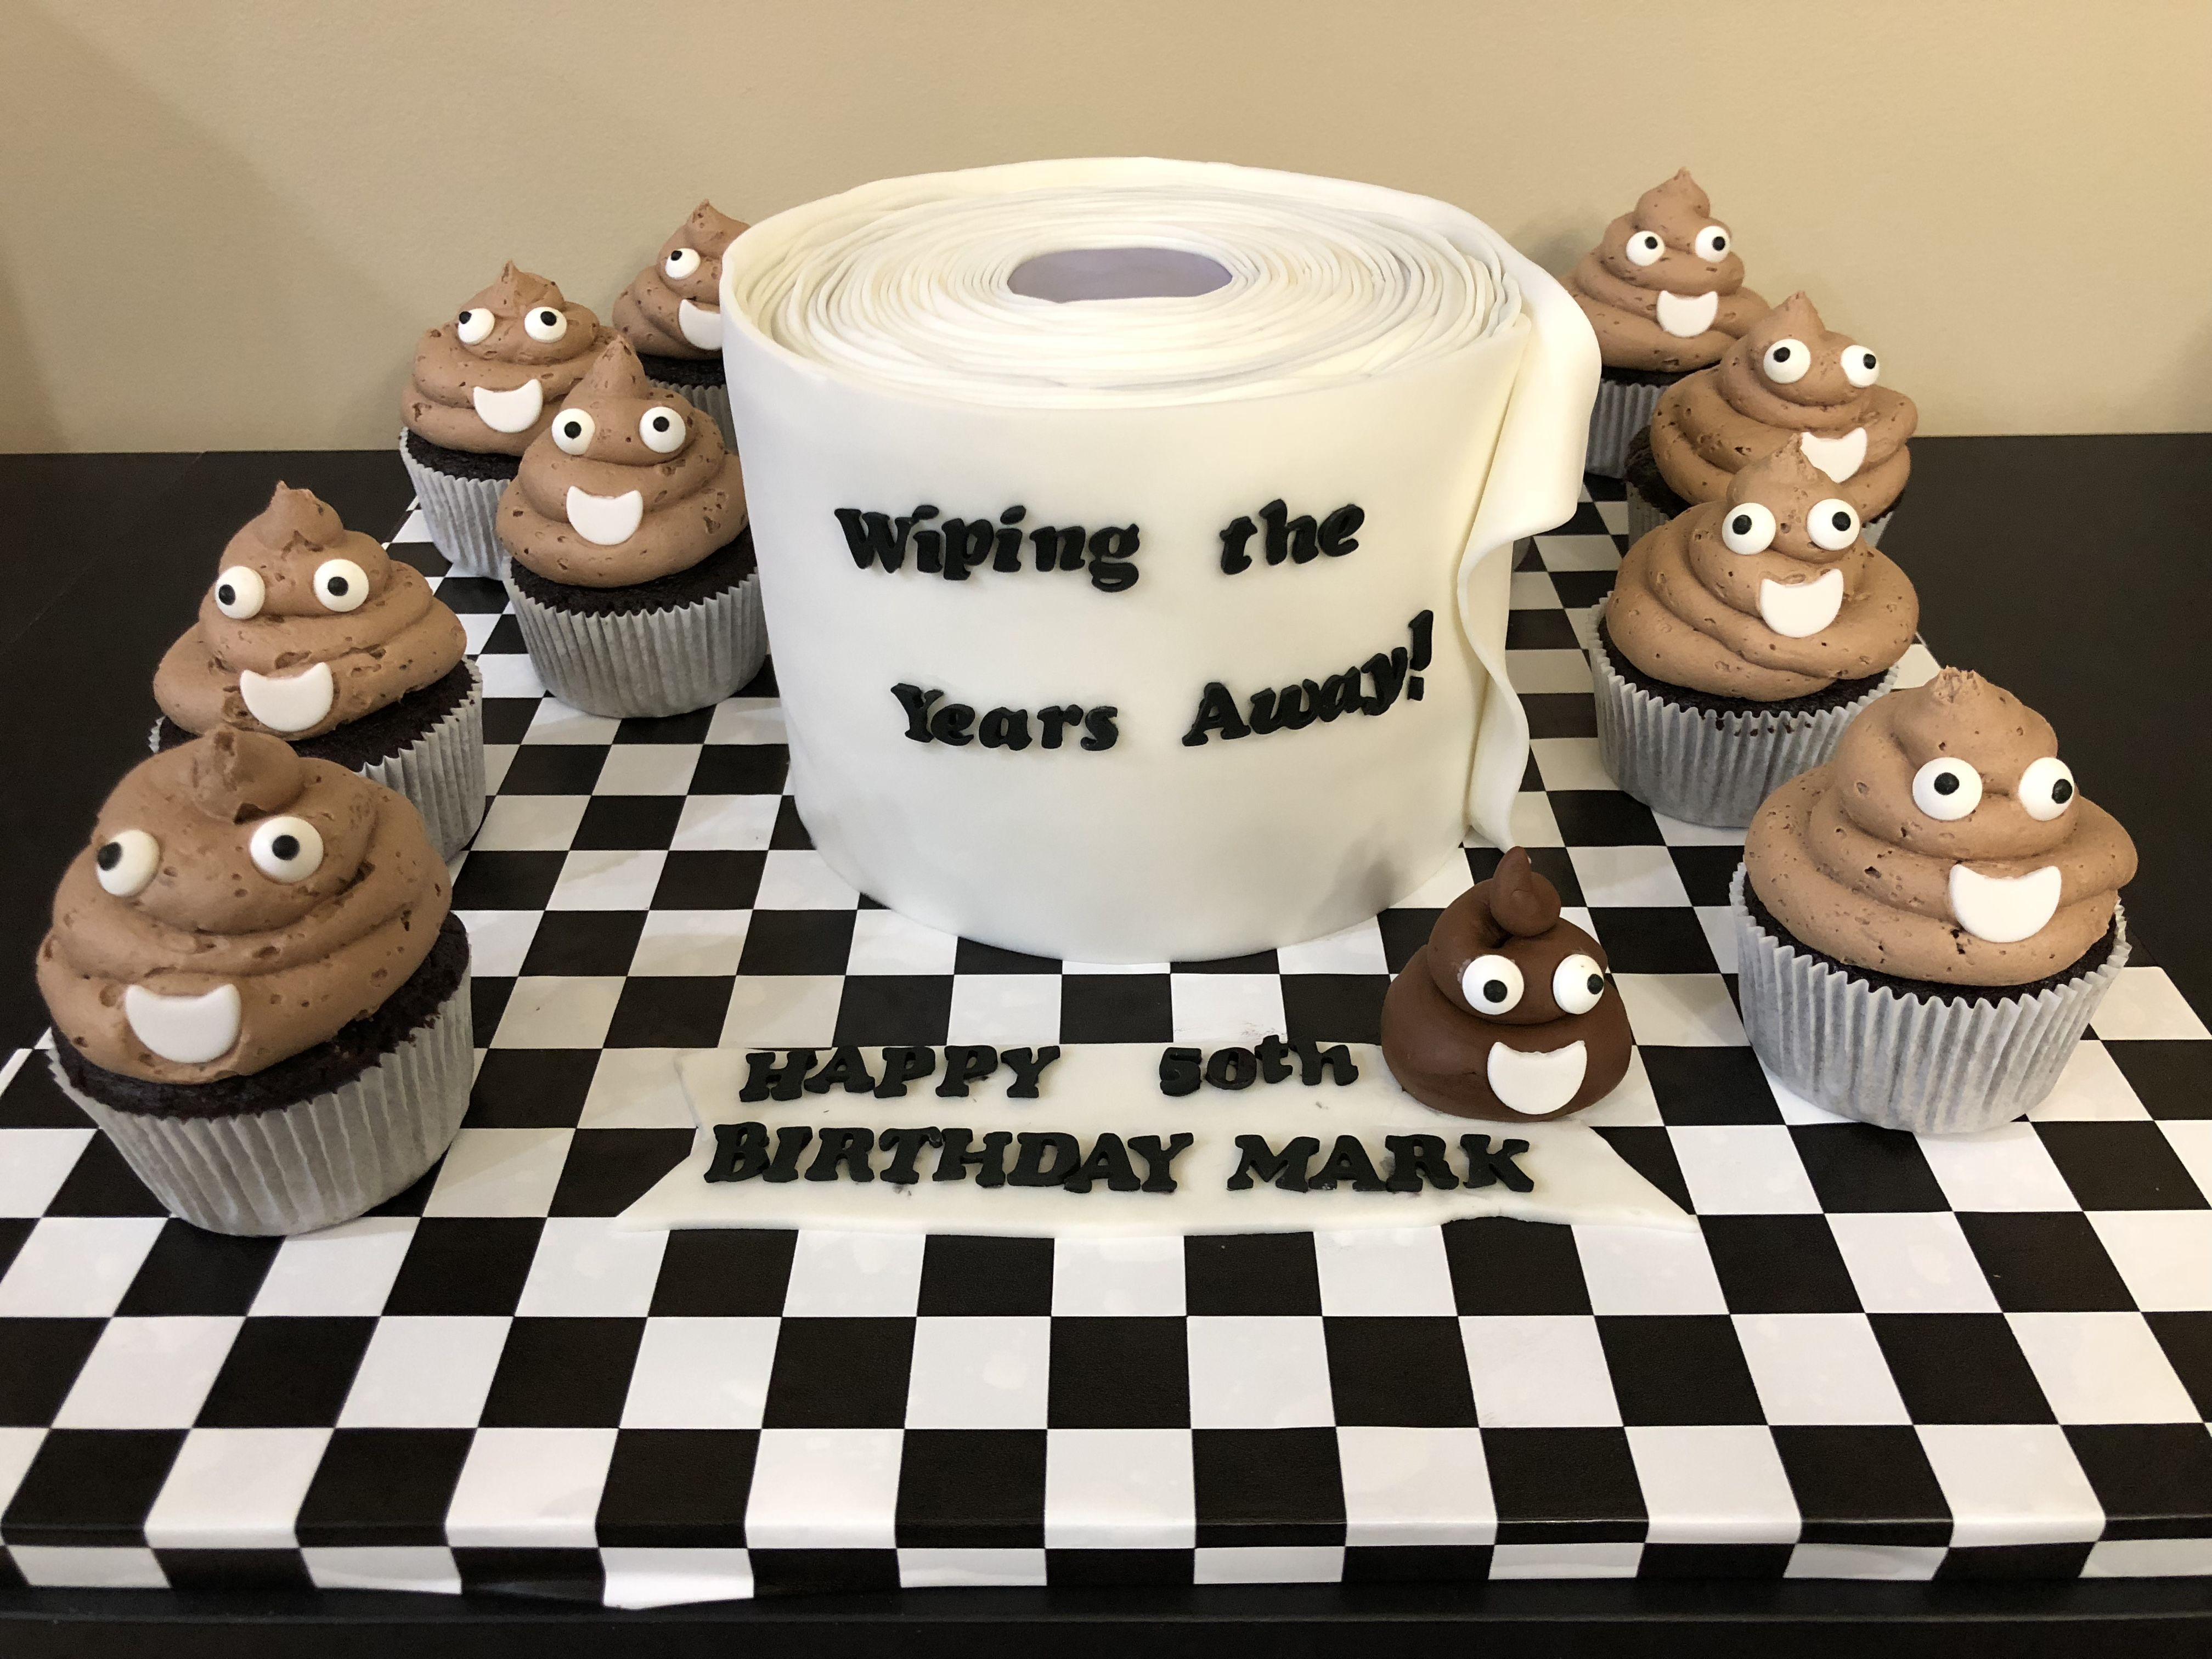 50th Birthday Cake Poop Emoji Cupcakes Toilet Paper Cake